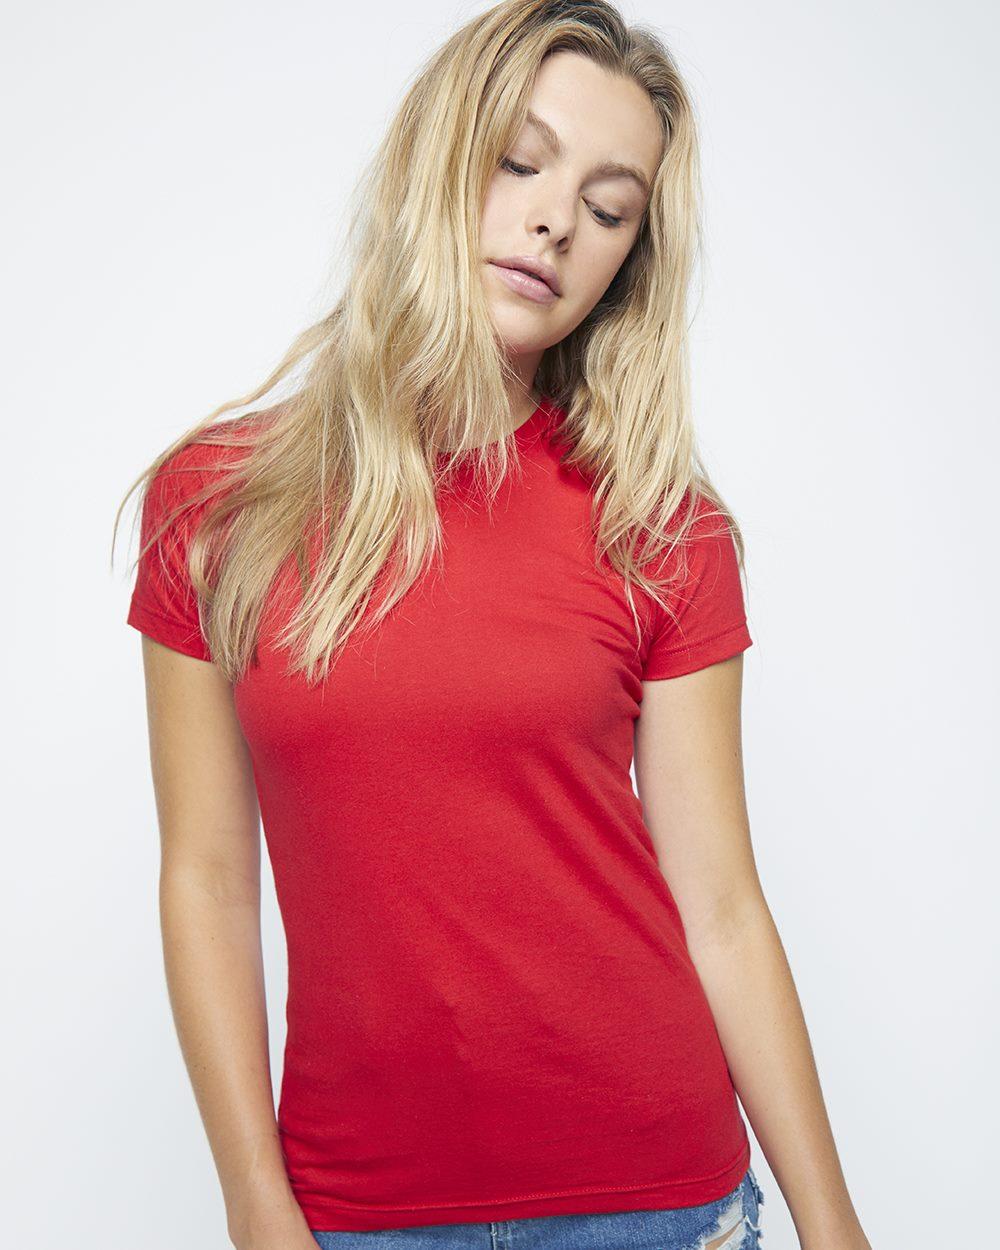 American Apparel Fine Jersey Seamless Shirt Dress From 3 88